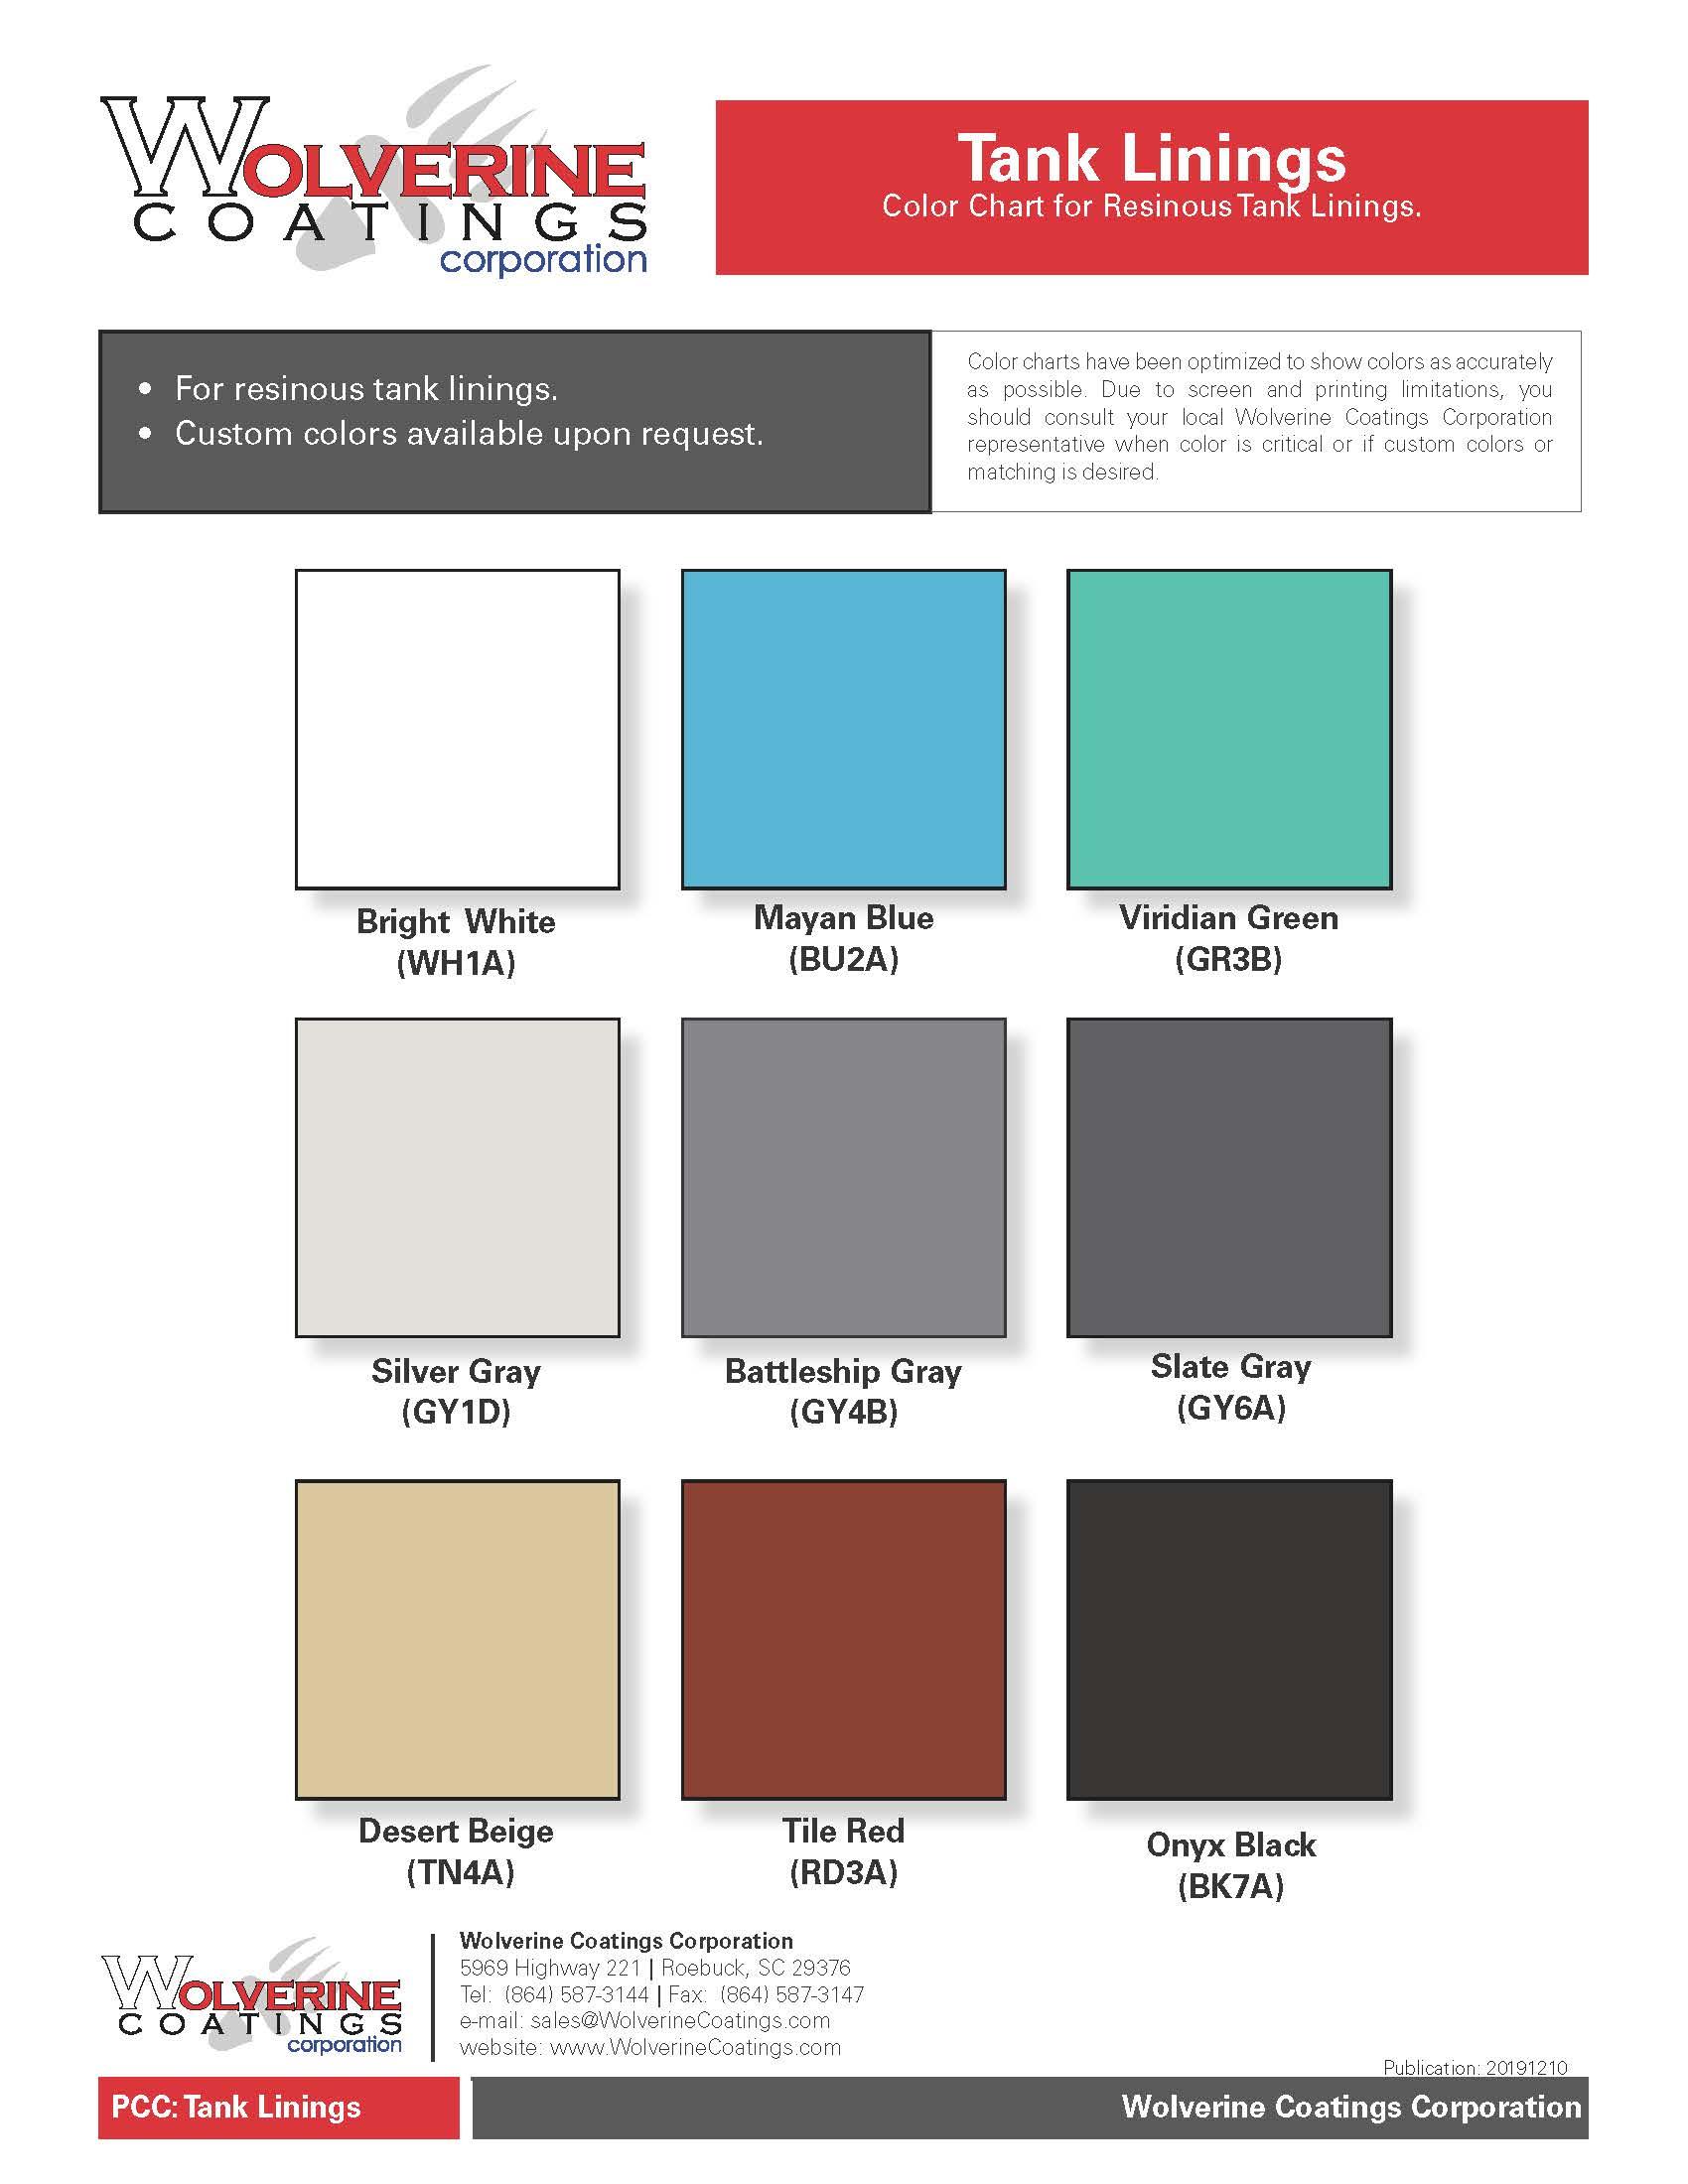 Tank Linings Color Chart-PCC